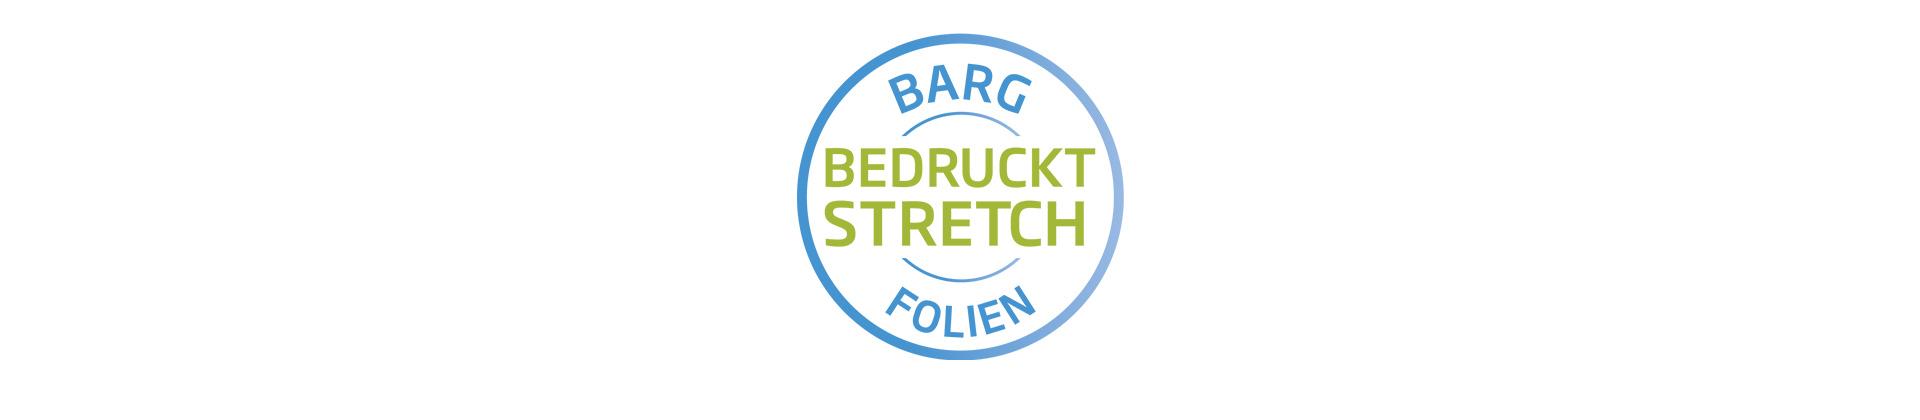 slider-barg-bedruckt-stretchfolien